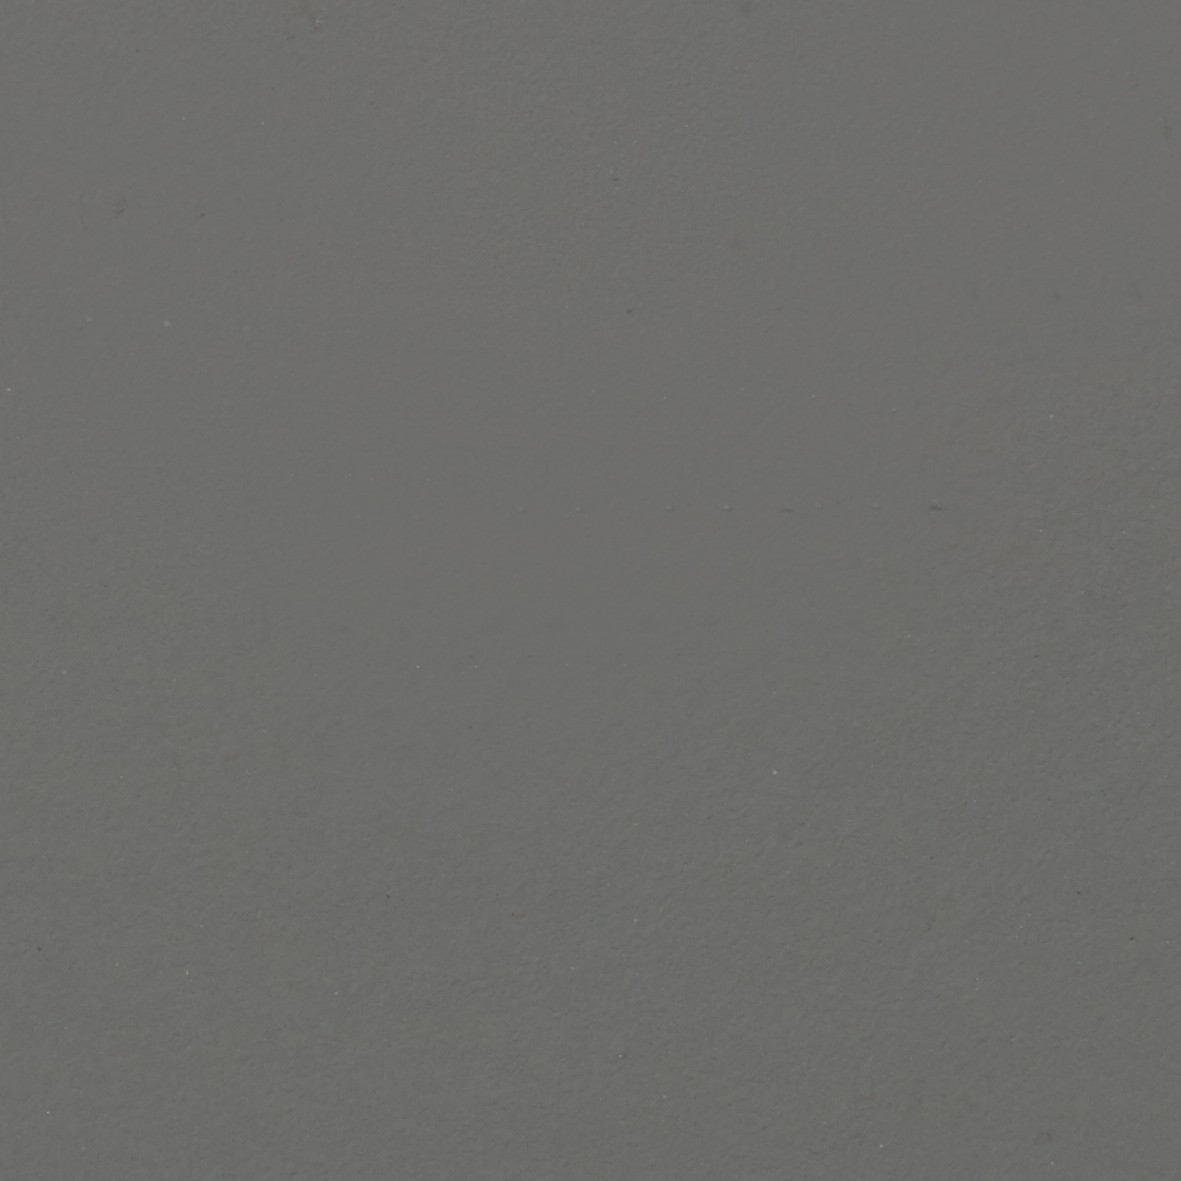 74 grigio quarzo opaco